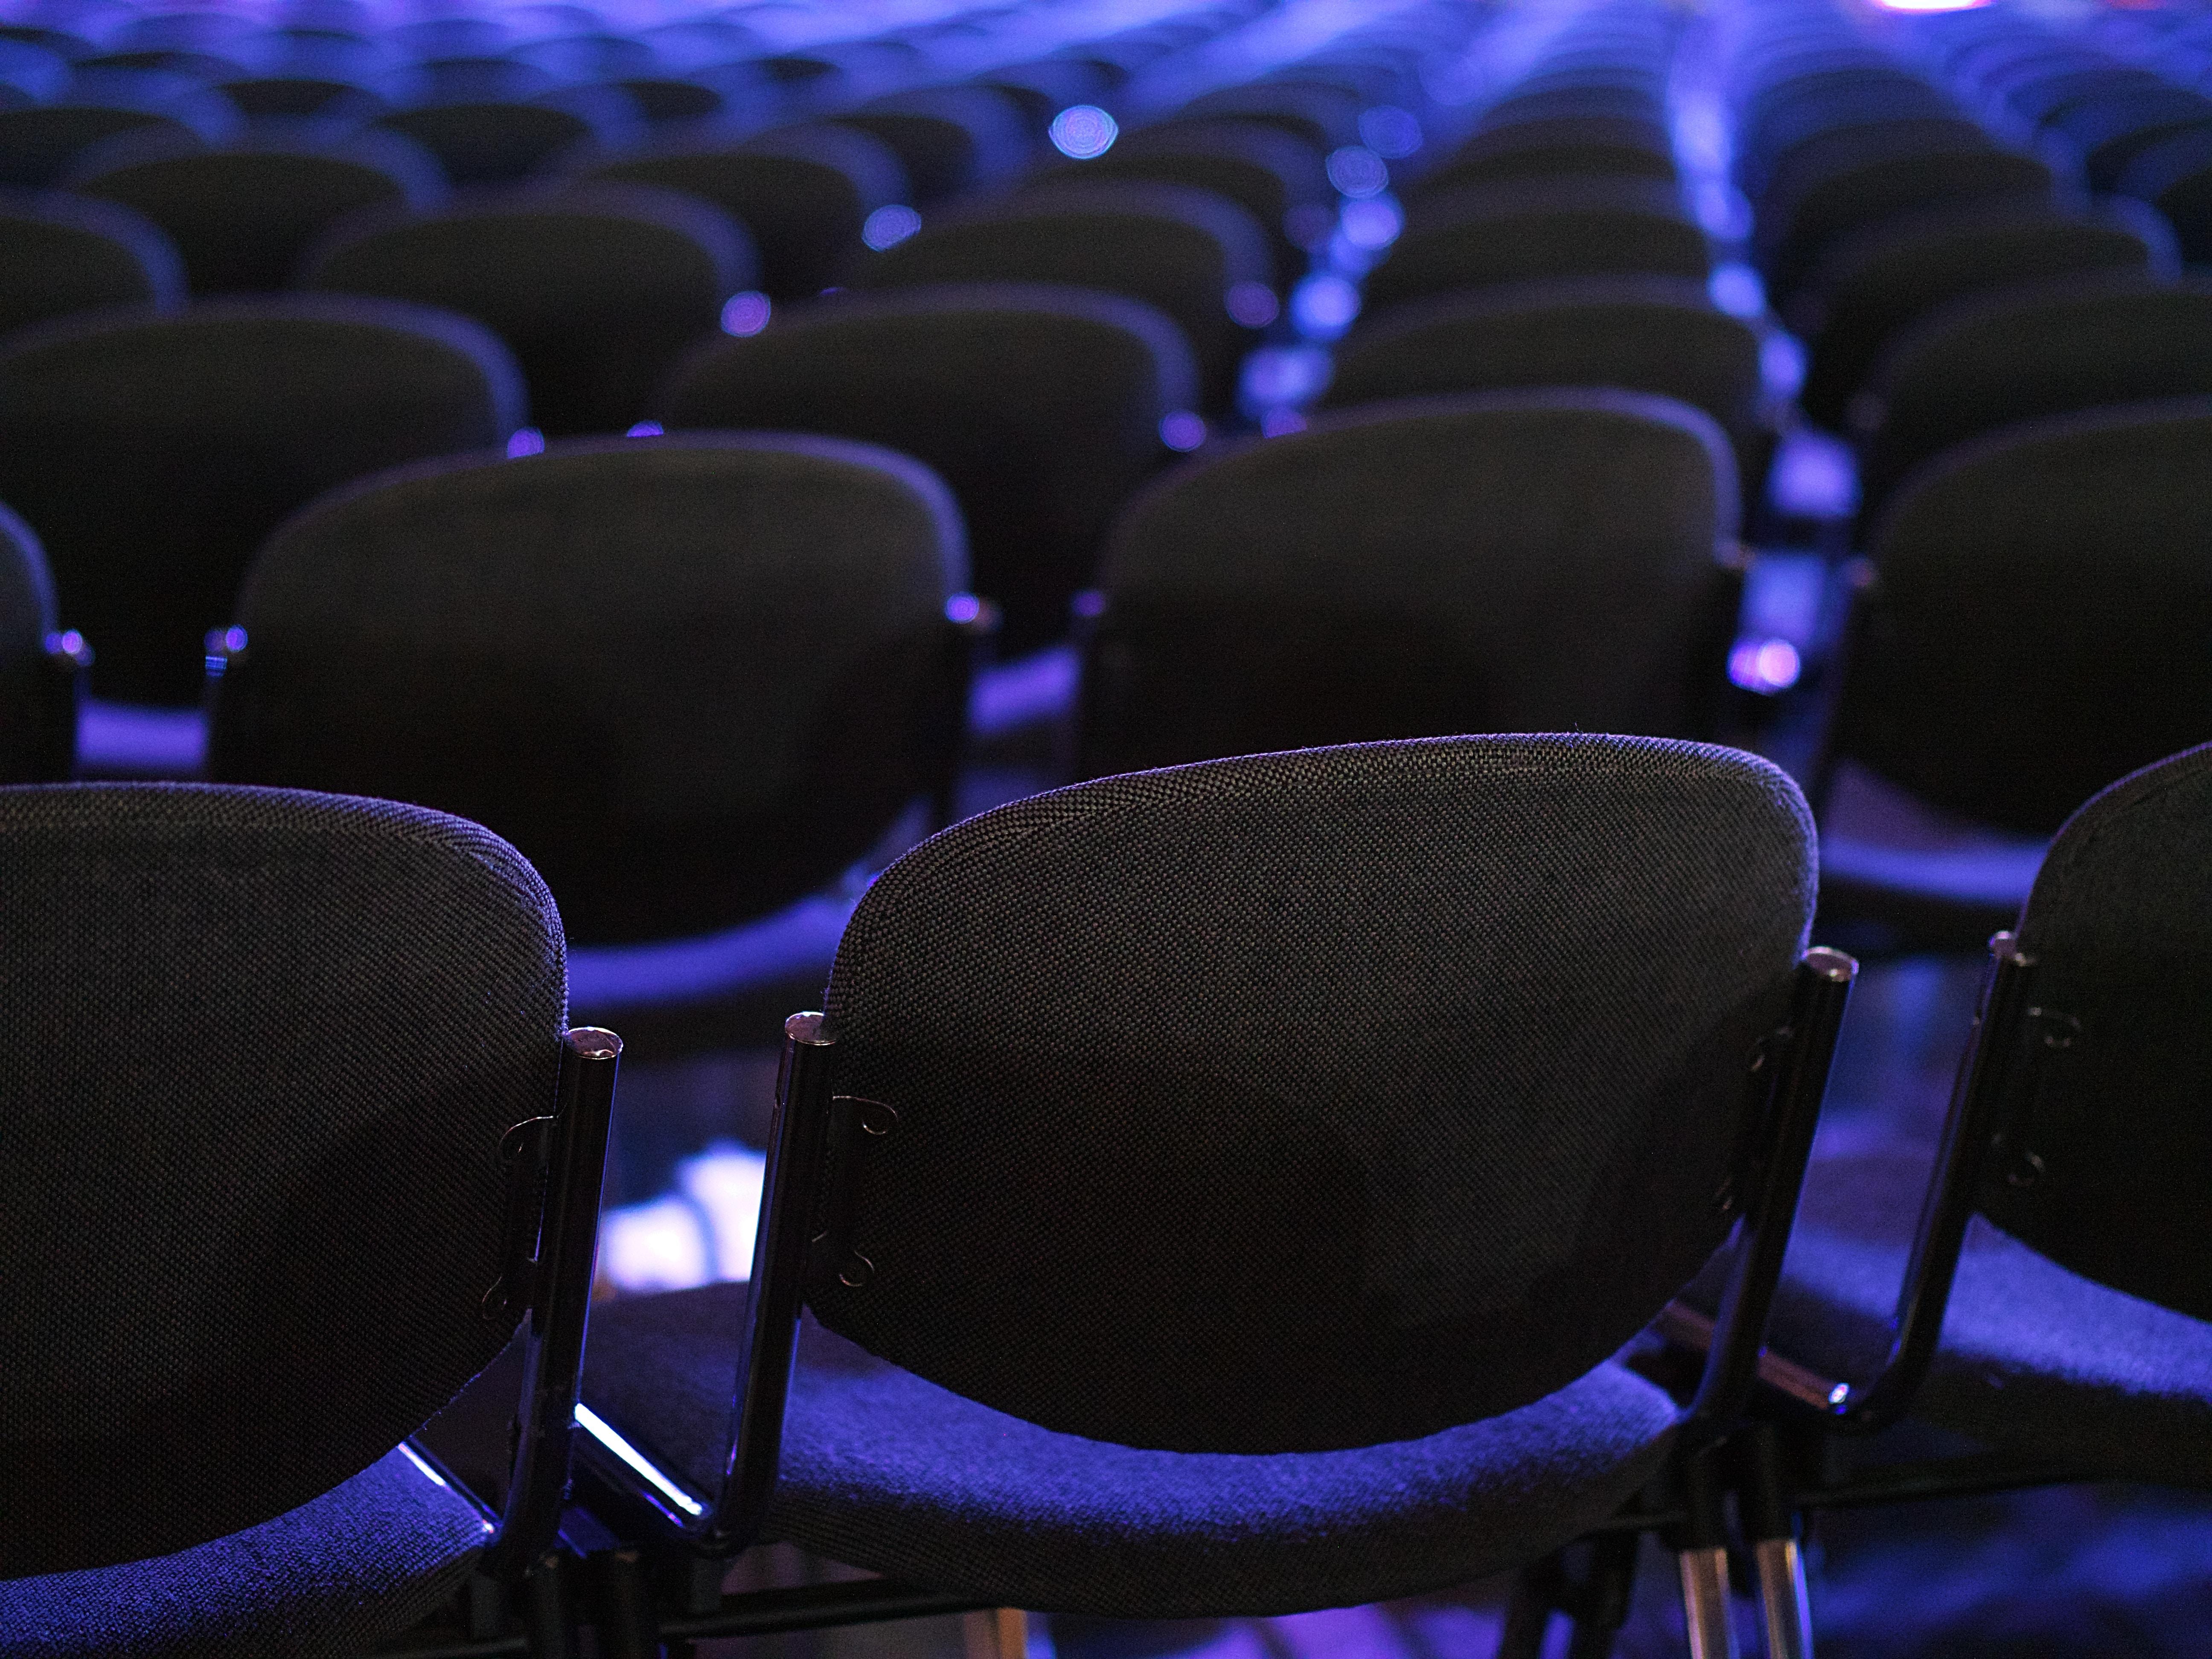 3 Tips for Winning Sponsorship Opportunities (IEG Roundtable Recap)